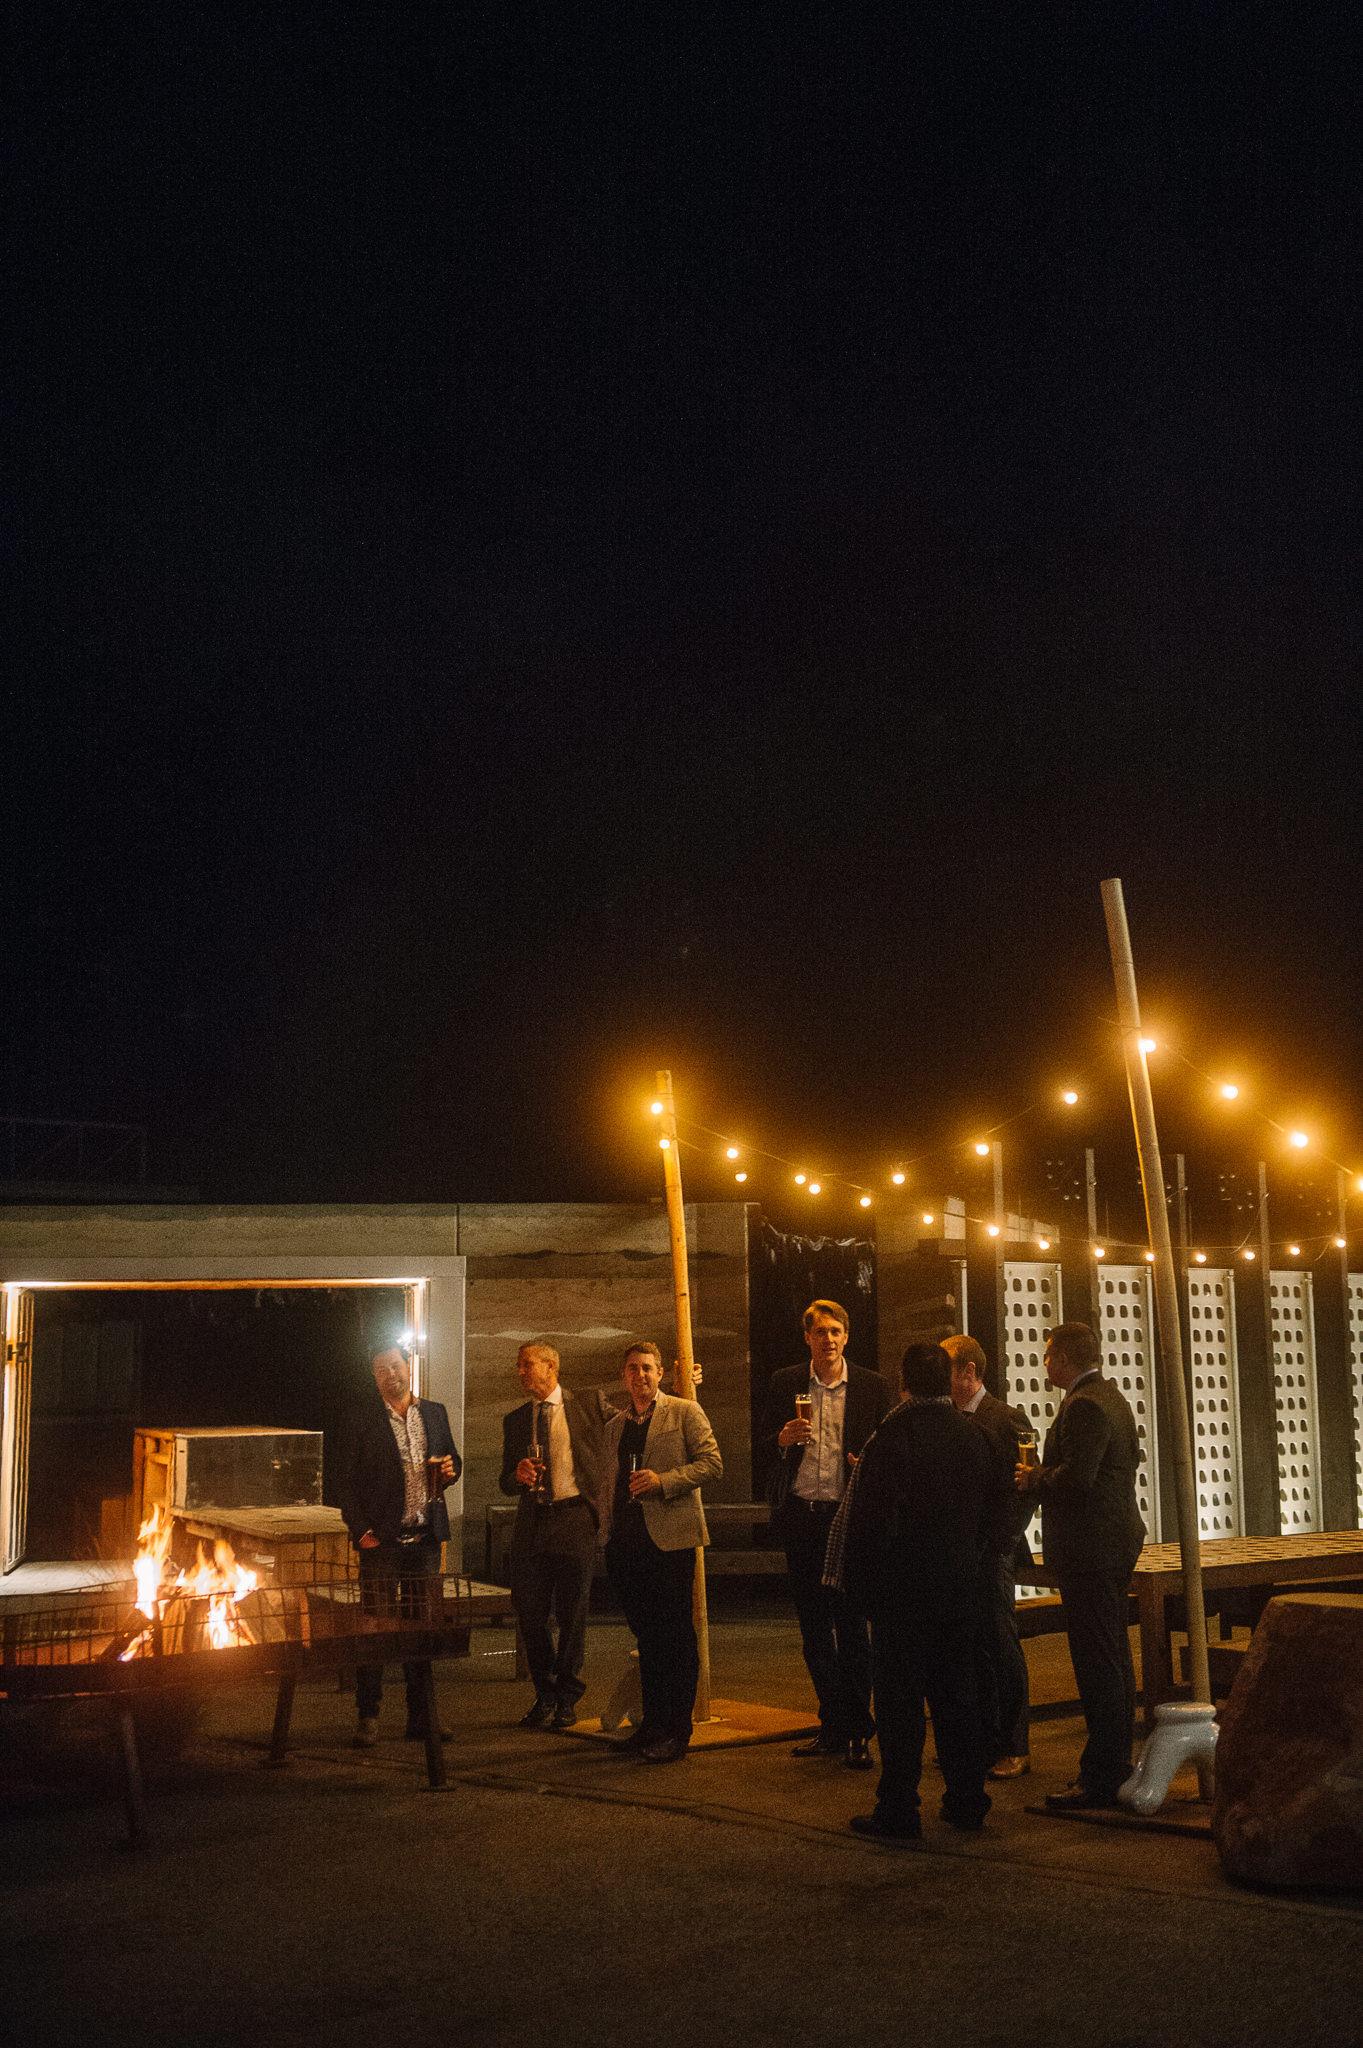 Tasmanian_Event_Photographer_37.jpg